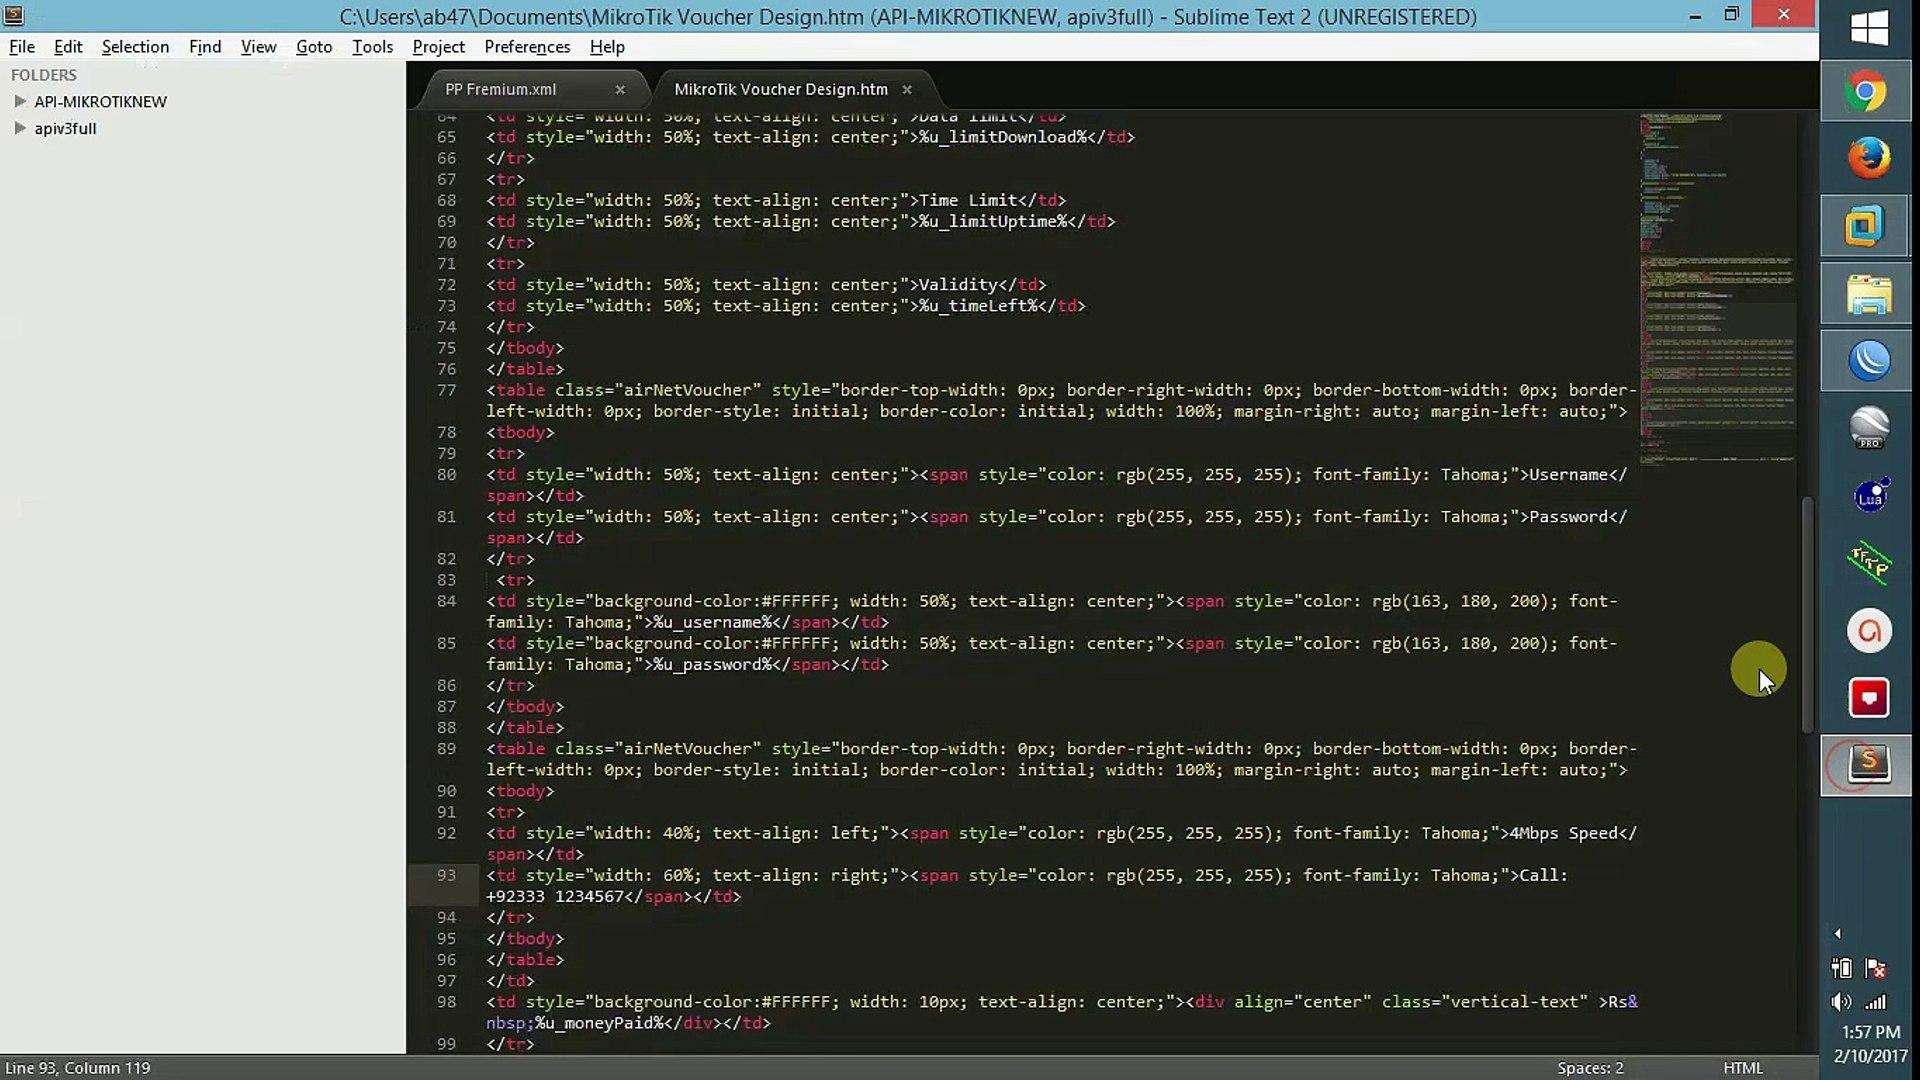 MikroTik - Usermanager Voucher Design Template | Userman voucher design